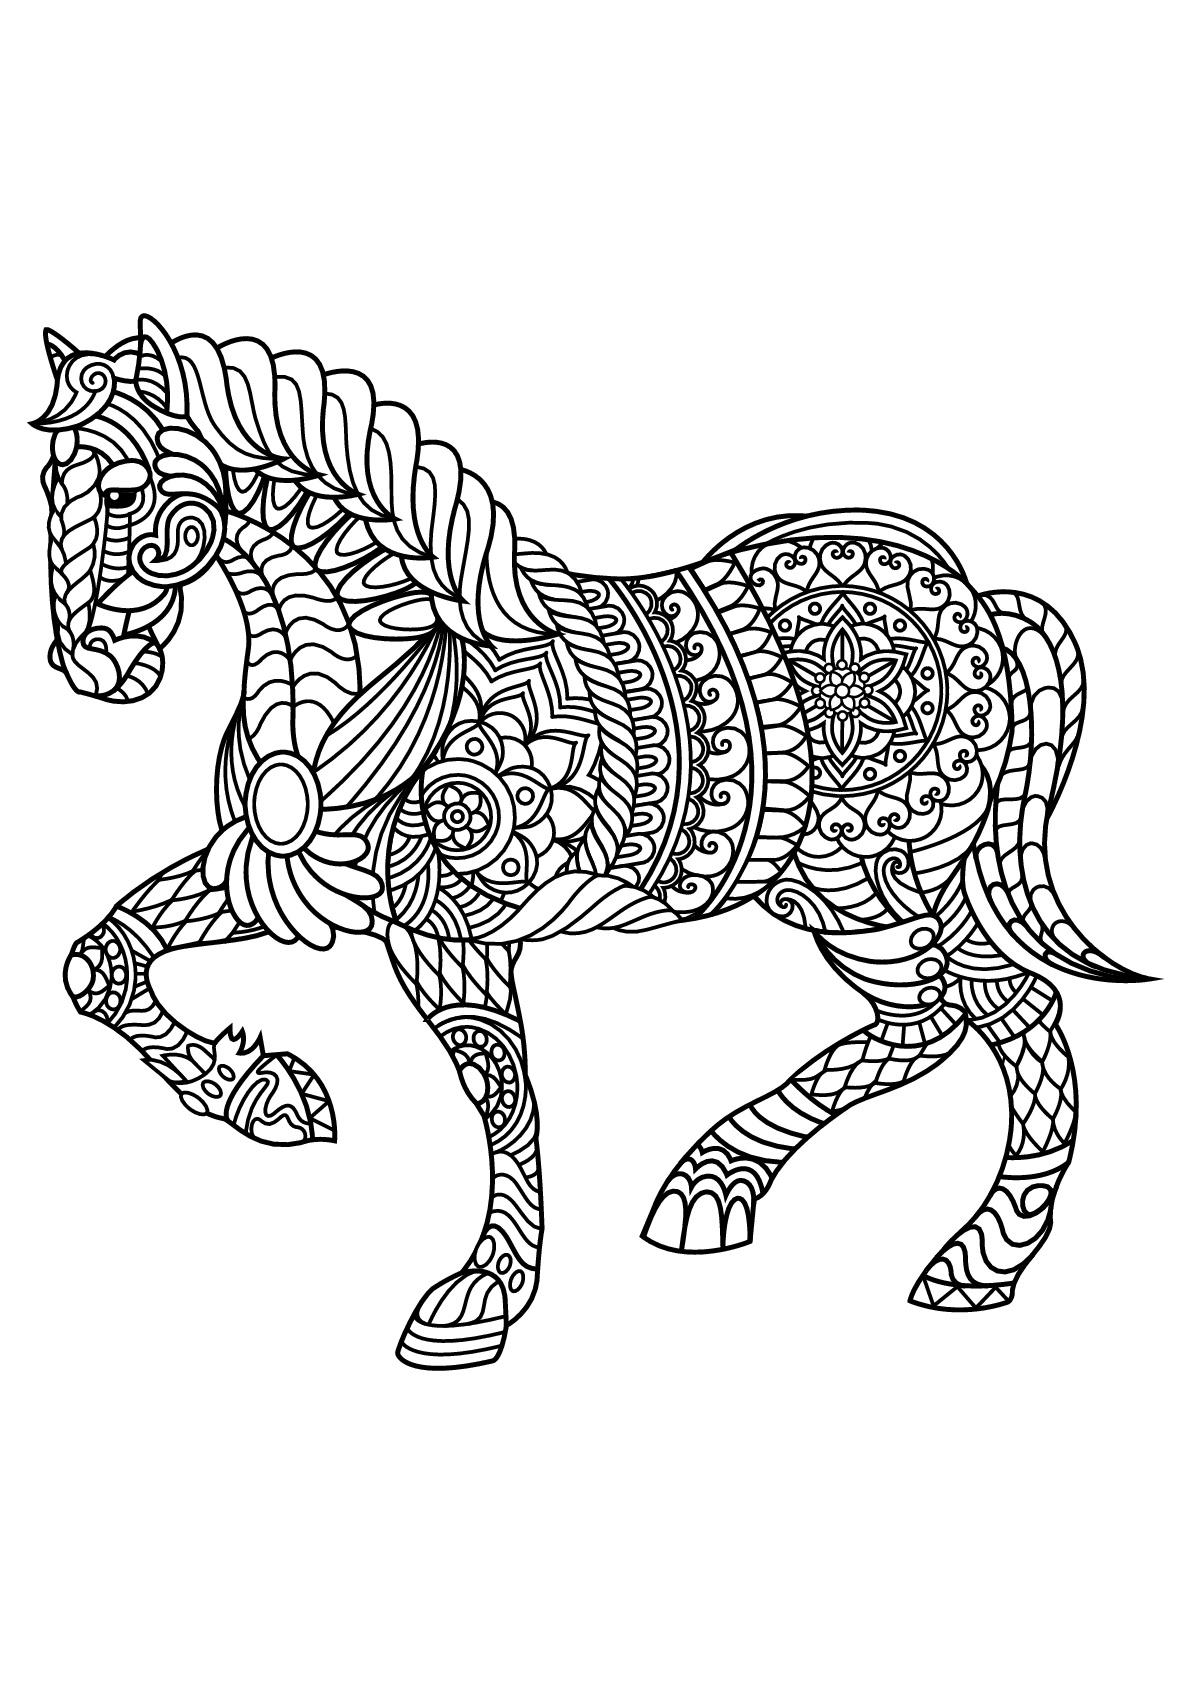 Pferde 46631 - Pferde - Malbuch Fur Erwachsene